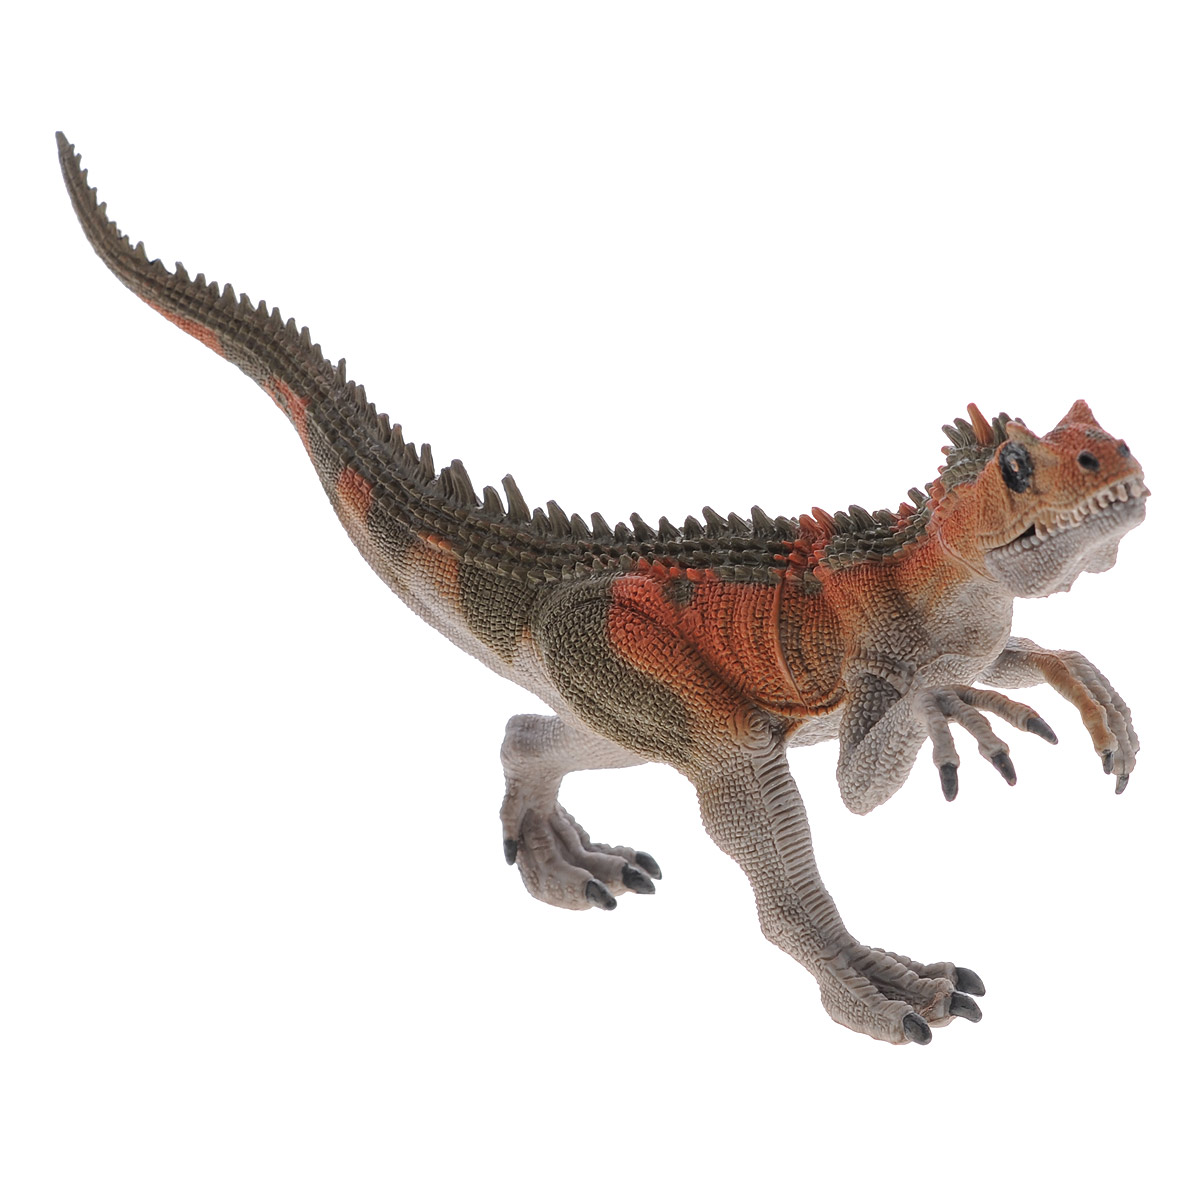 цена на Фигурка Megasaurs Заурофагнакс с двигающейся пастью, цвет: серый